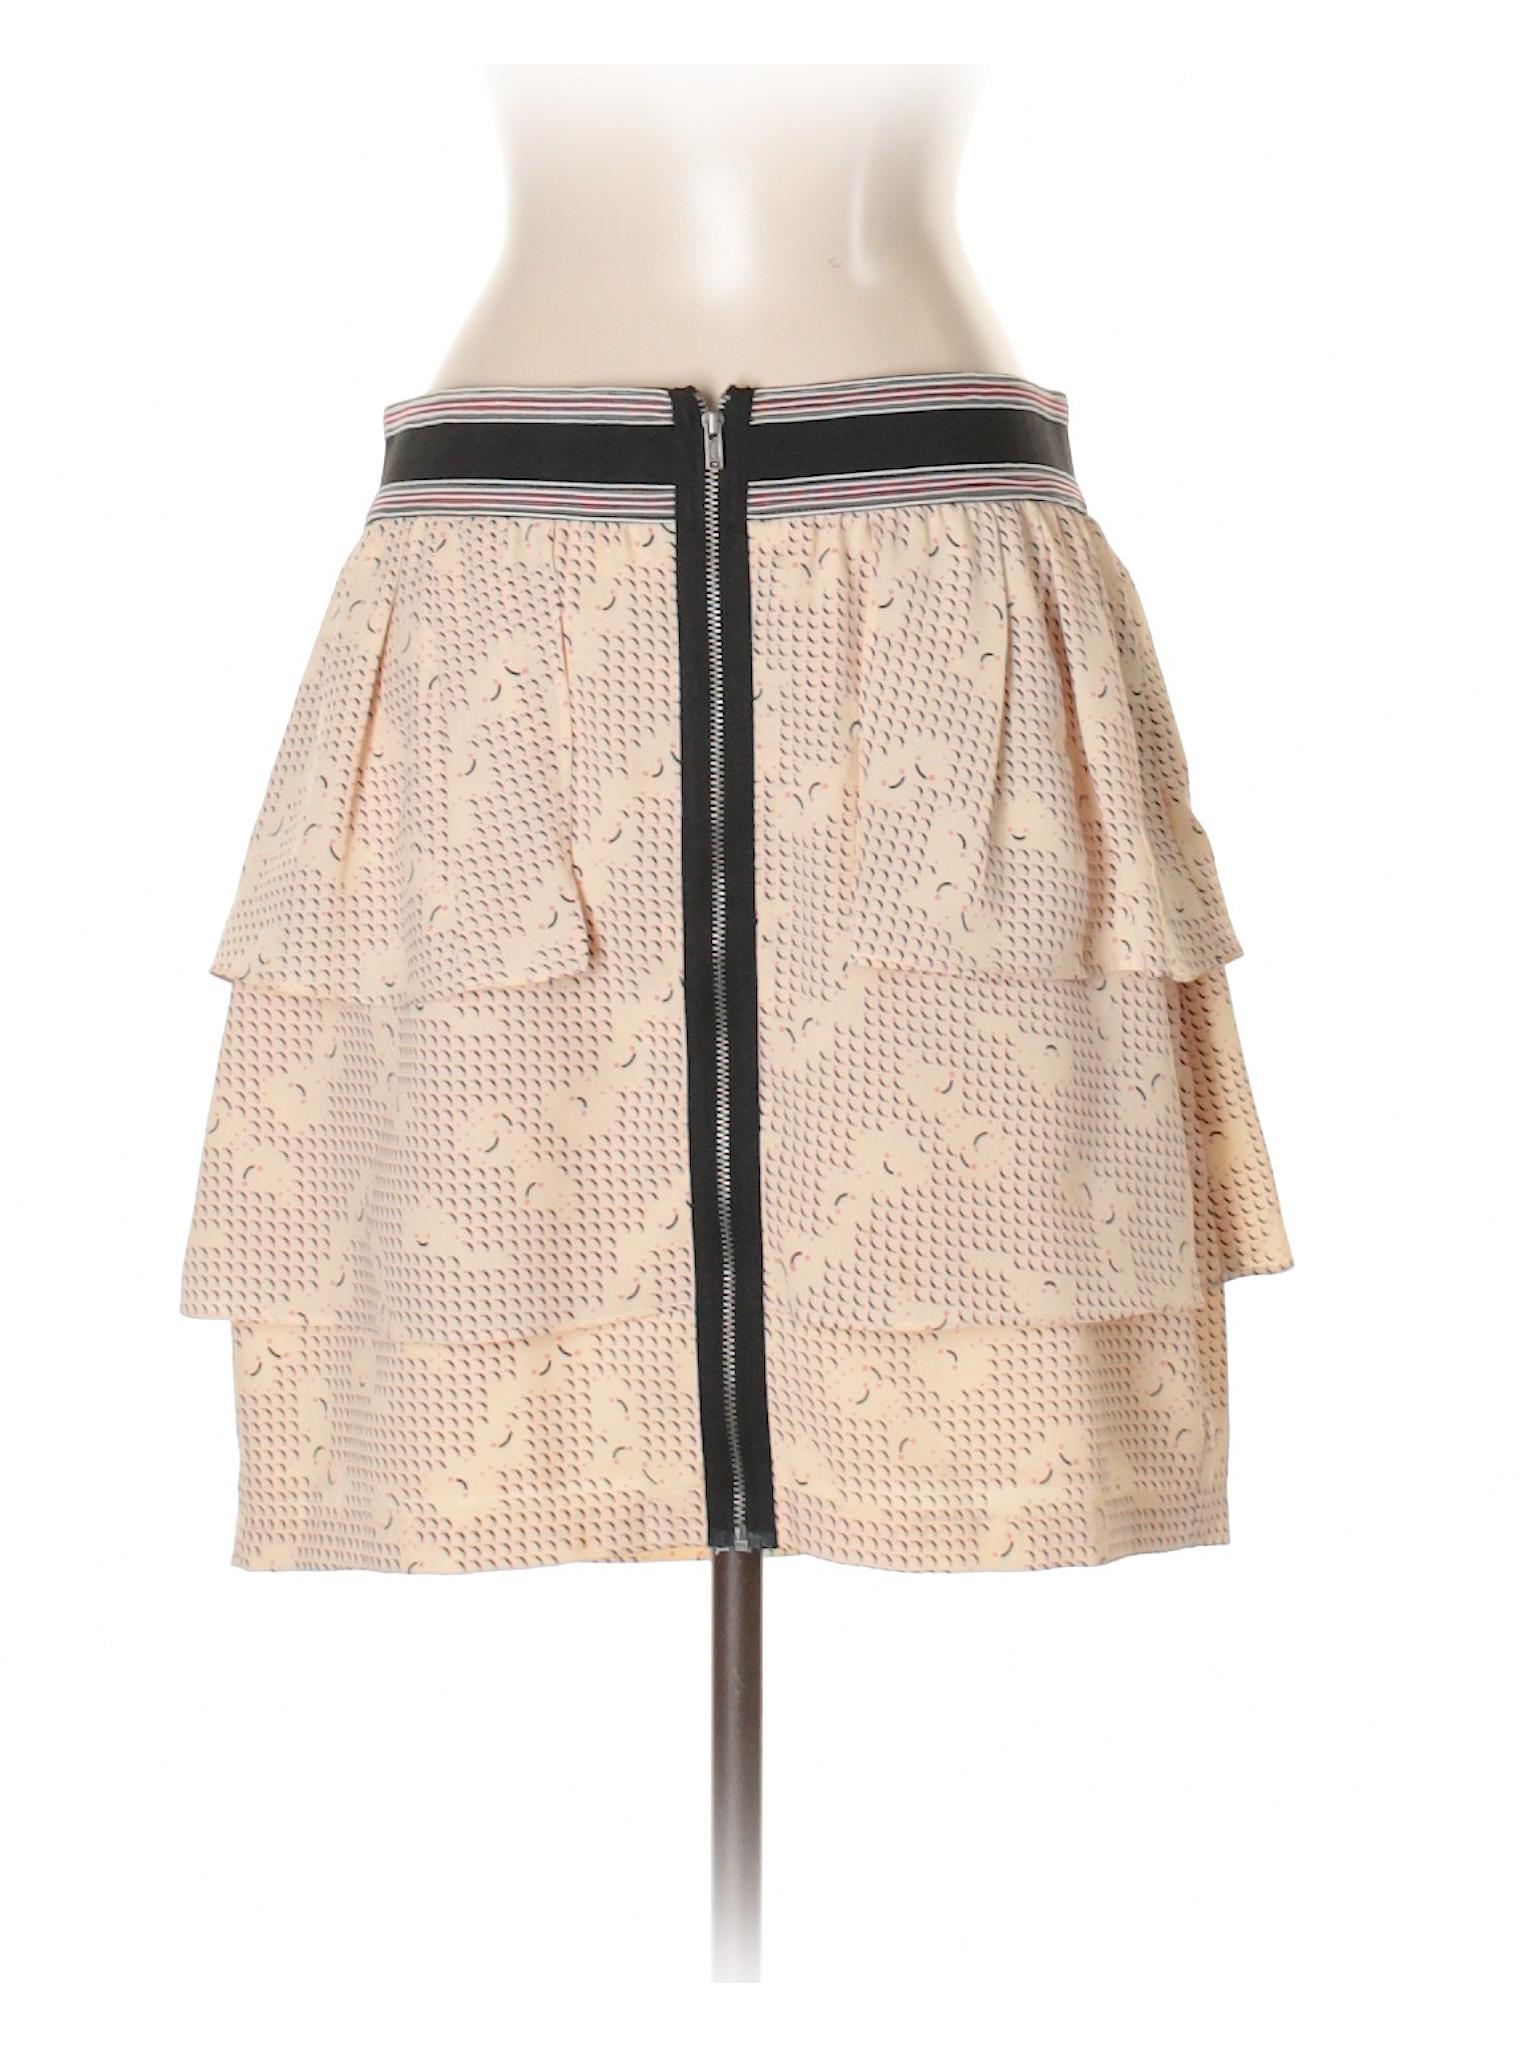 Skirt Boutique Boutique Casual Boutique Casual Skirt Casual Boutique Skirt xqInBU